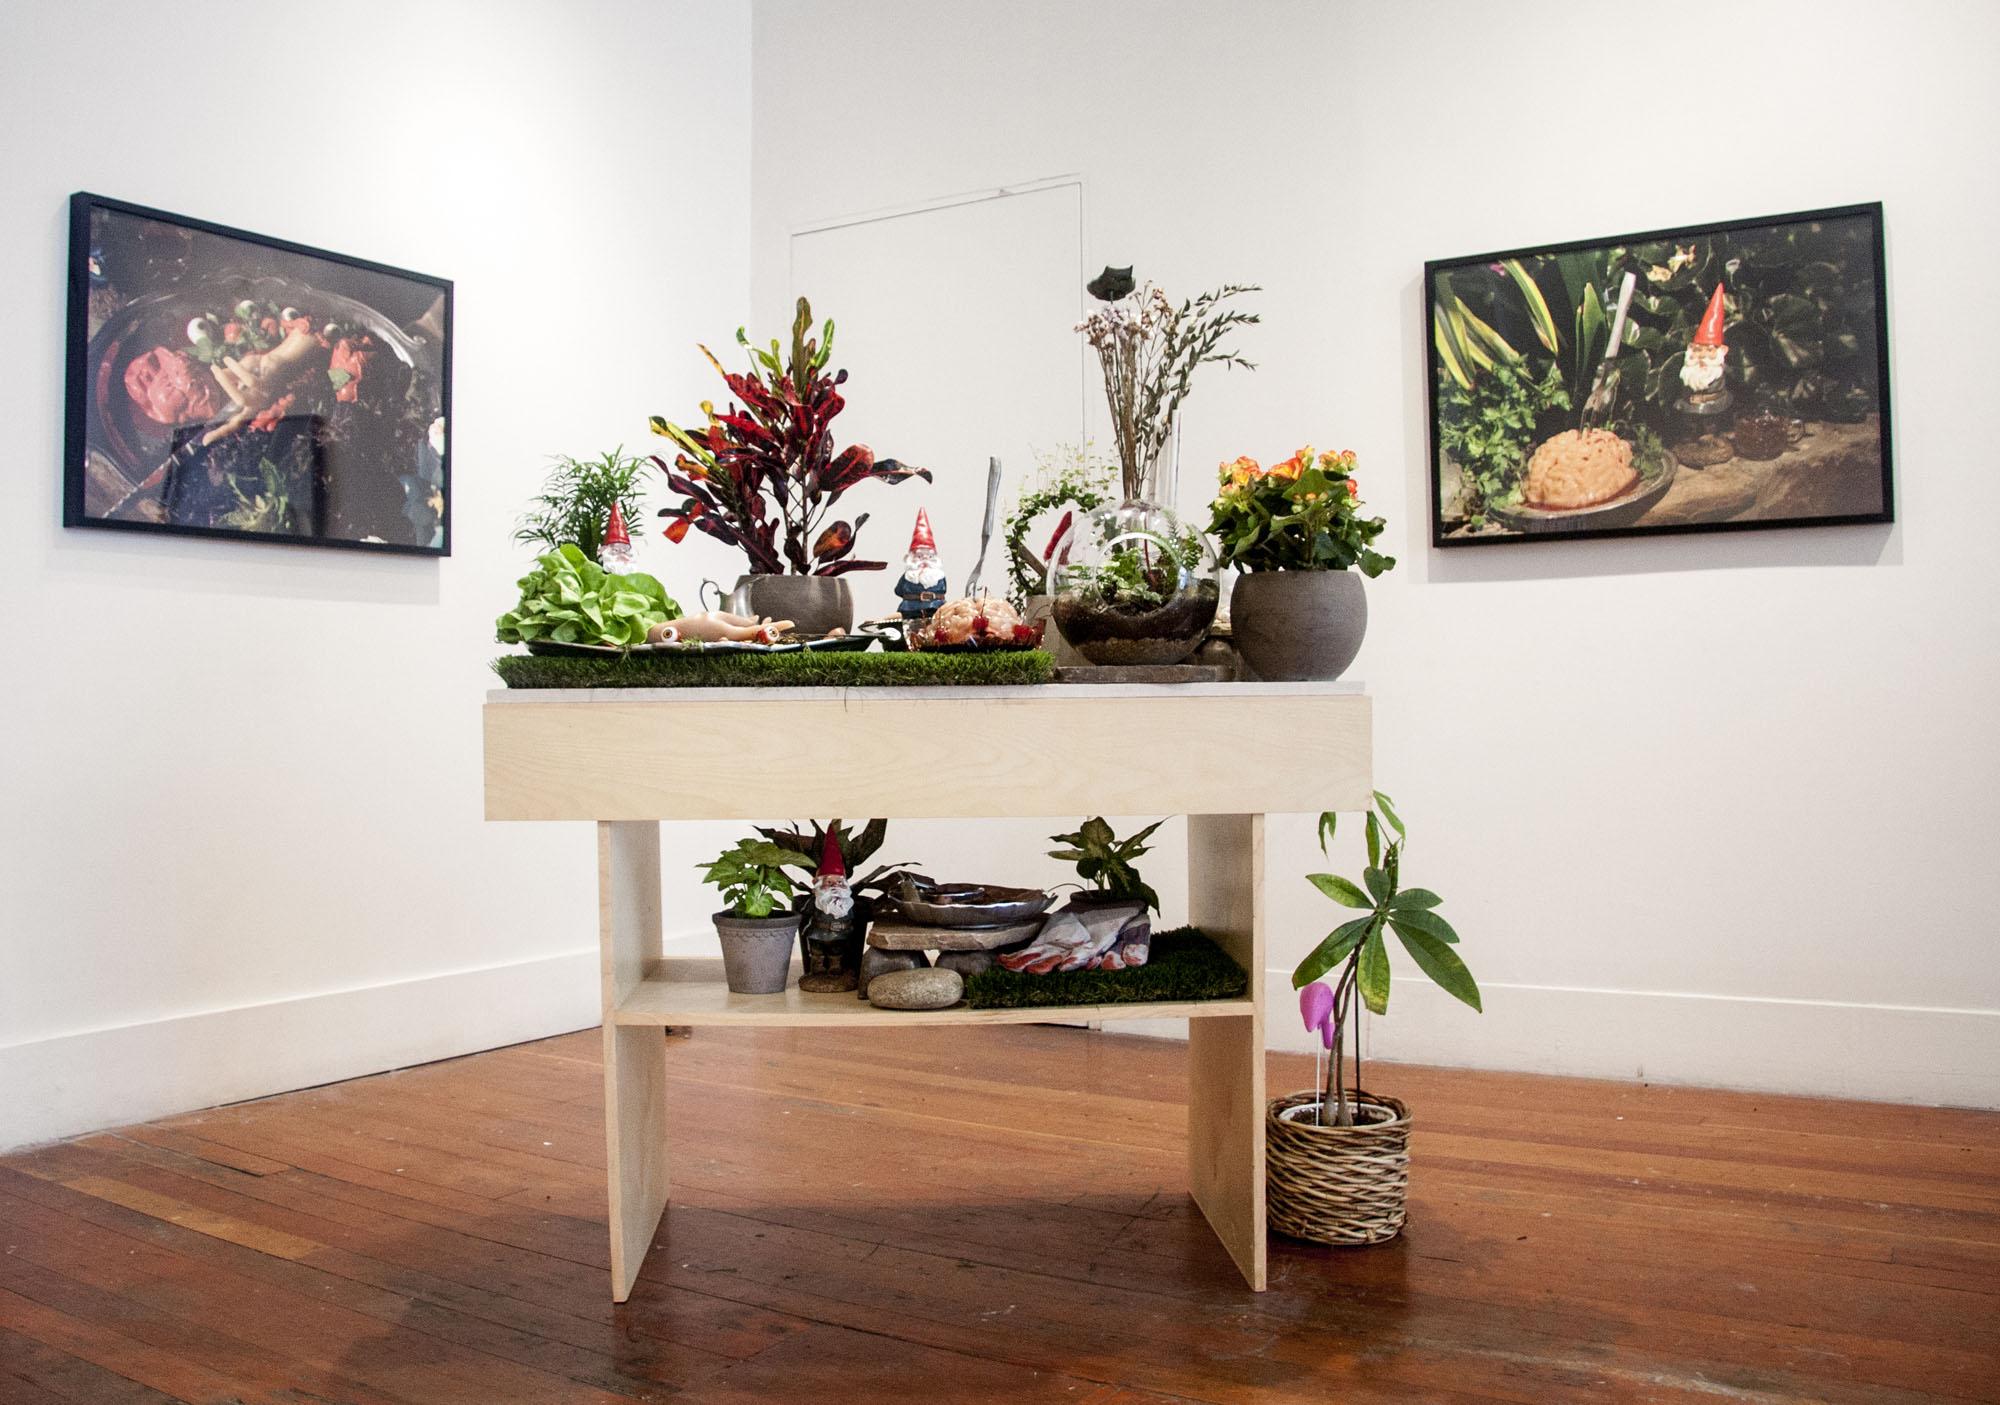 Garden Party: Post-Gnome Apocalypse, installation view